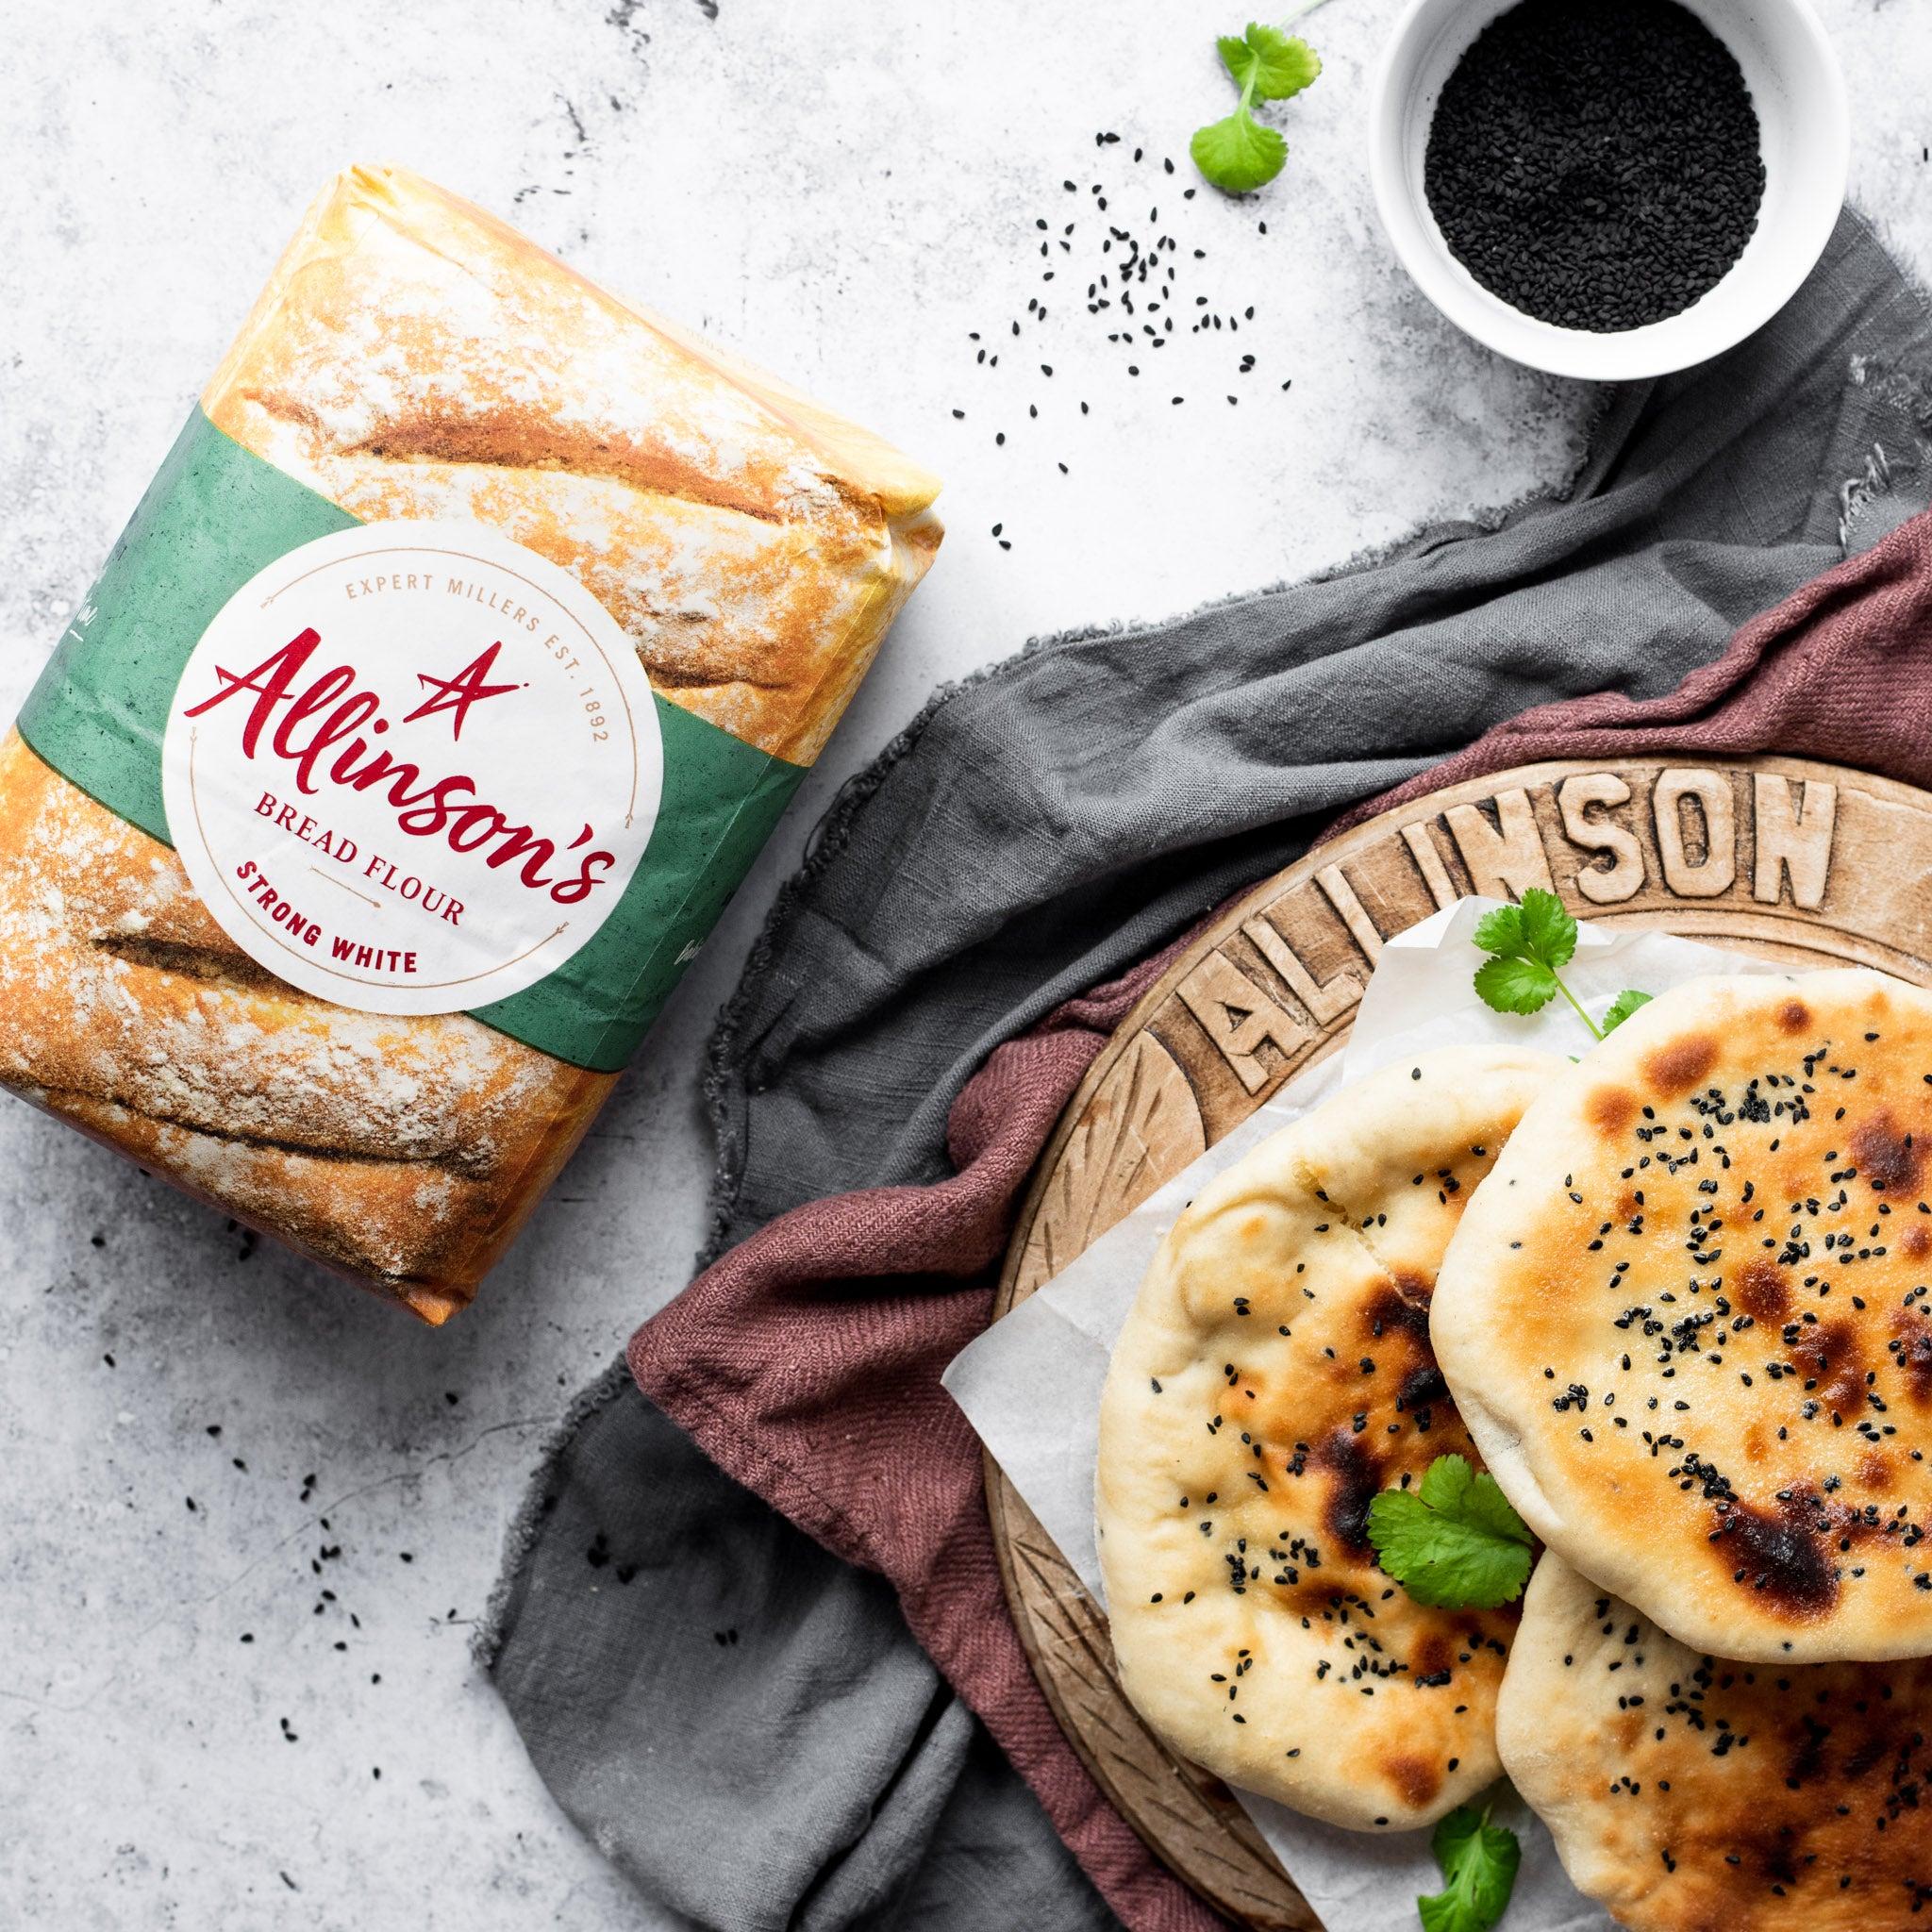 Allinsons-Naan-Bread-1-1-Baking-Mad-7.jpg